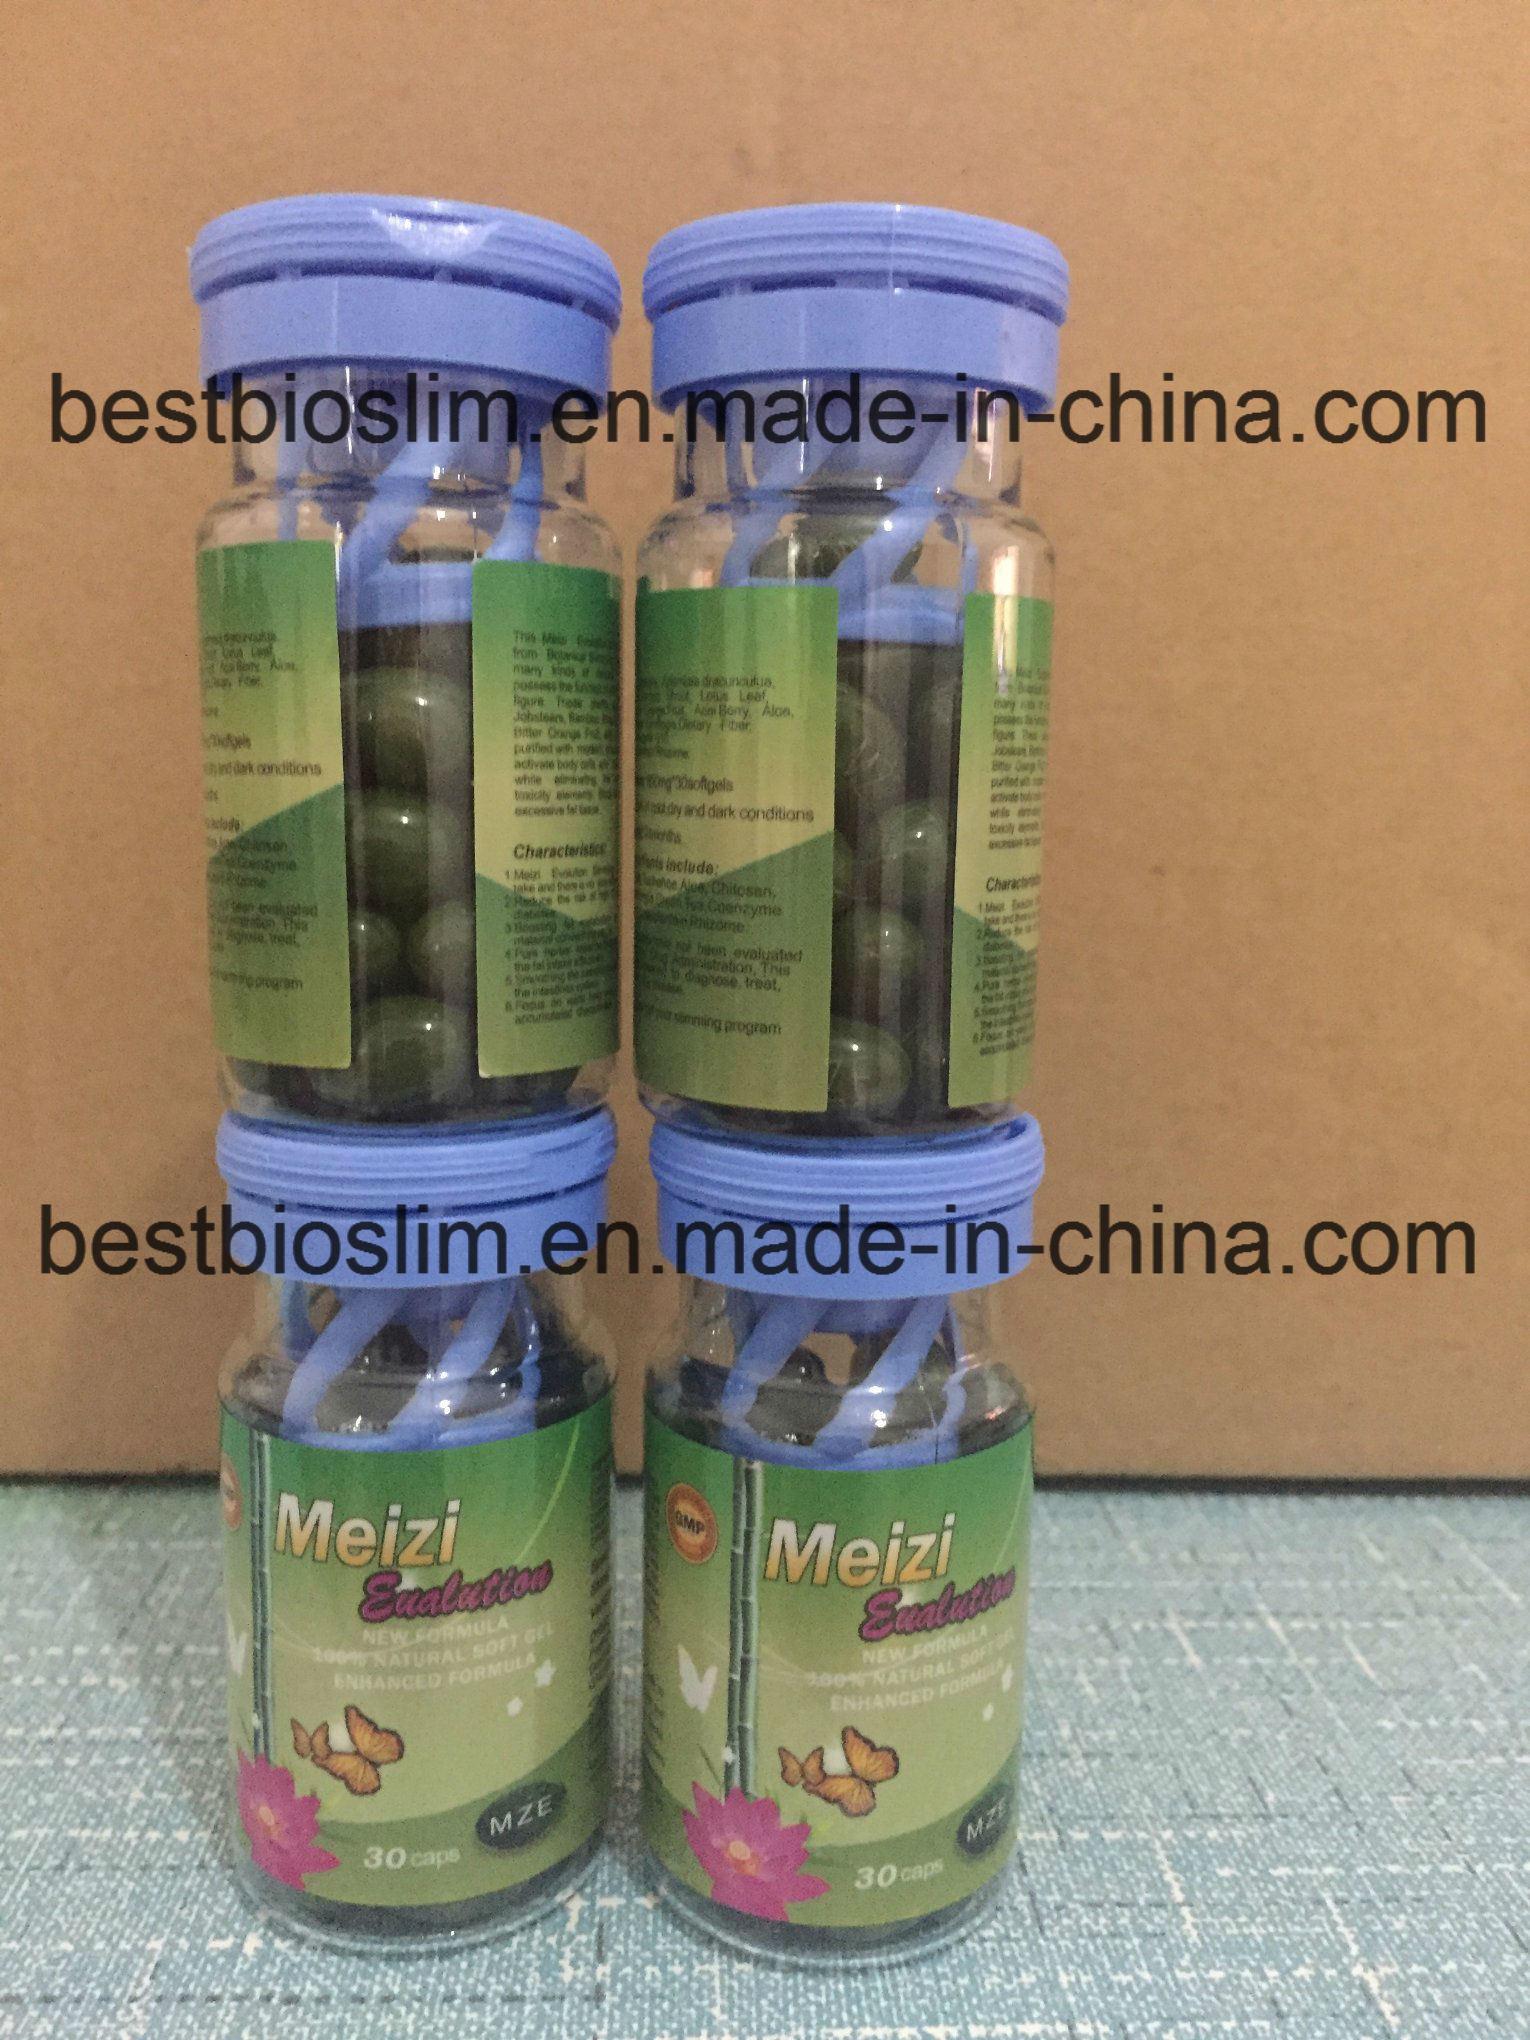 Meizi Evolution Slimming Softgel Botanical Mze